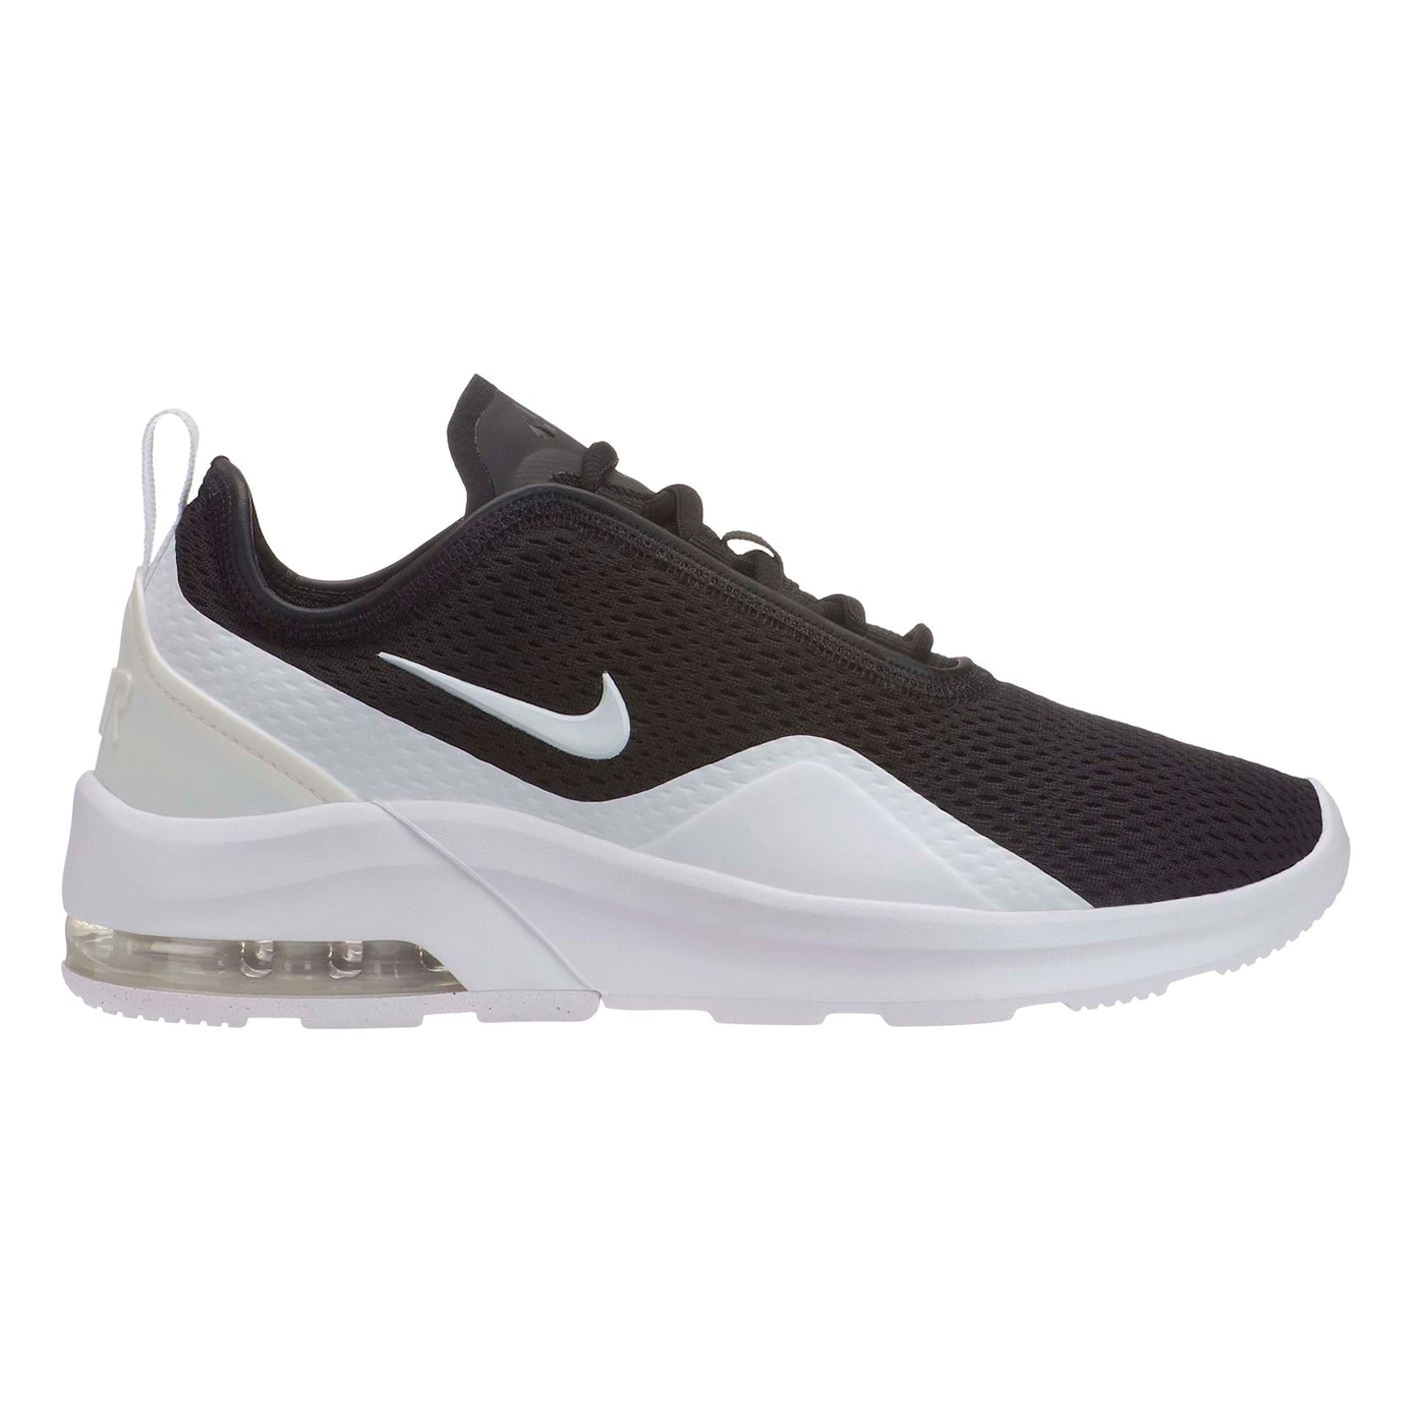 Nike Air Max Motion 2 dámske tenisky